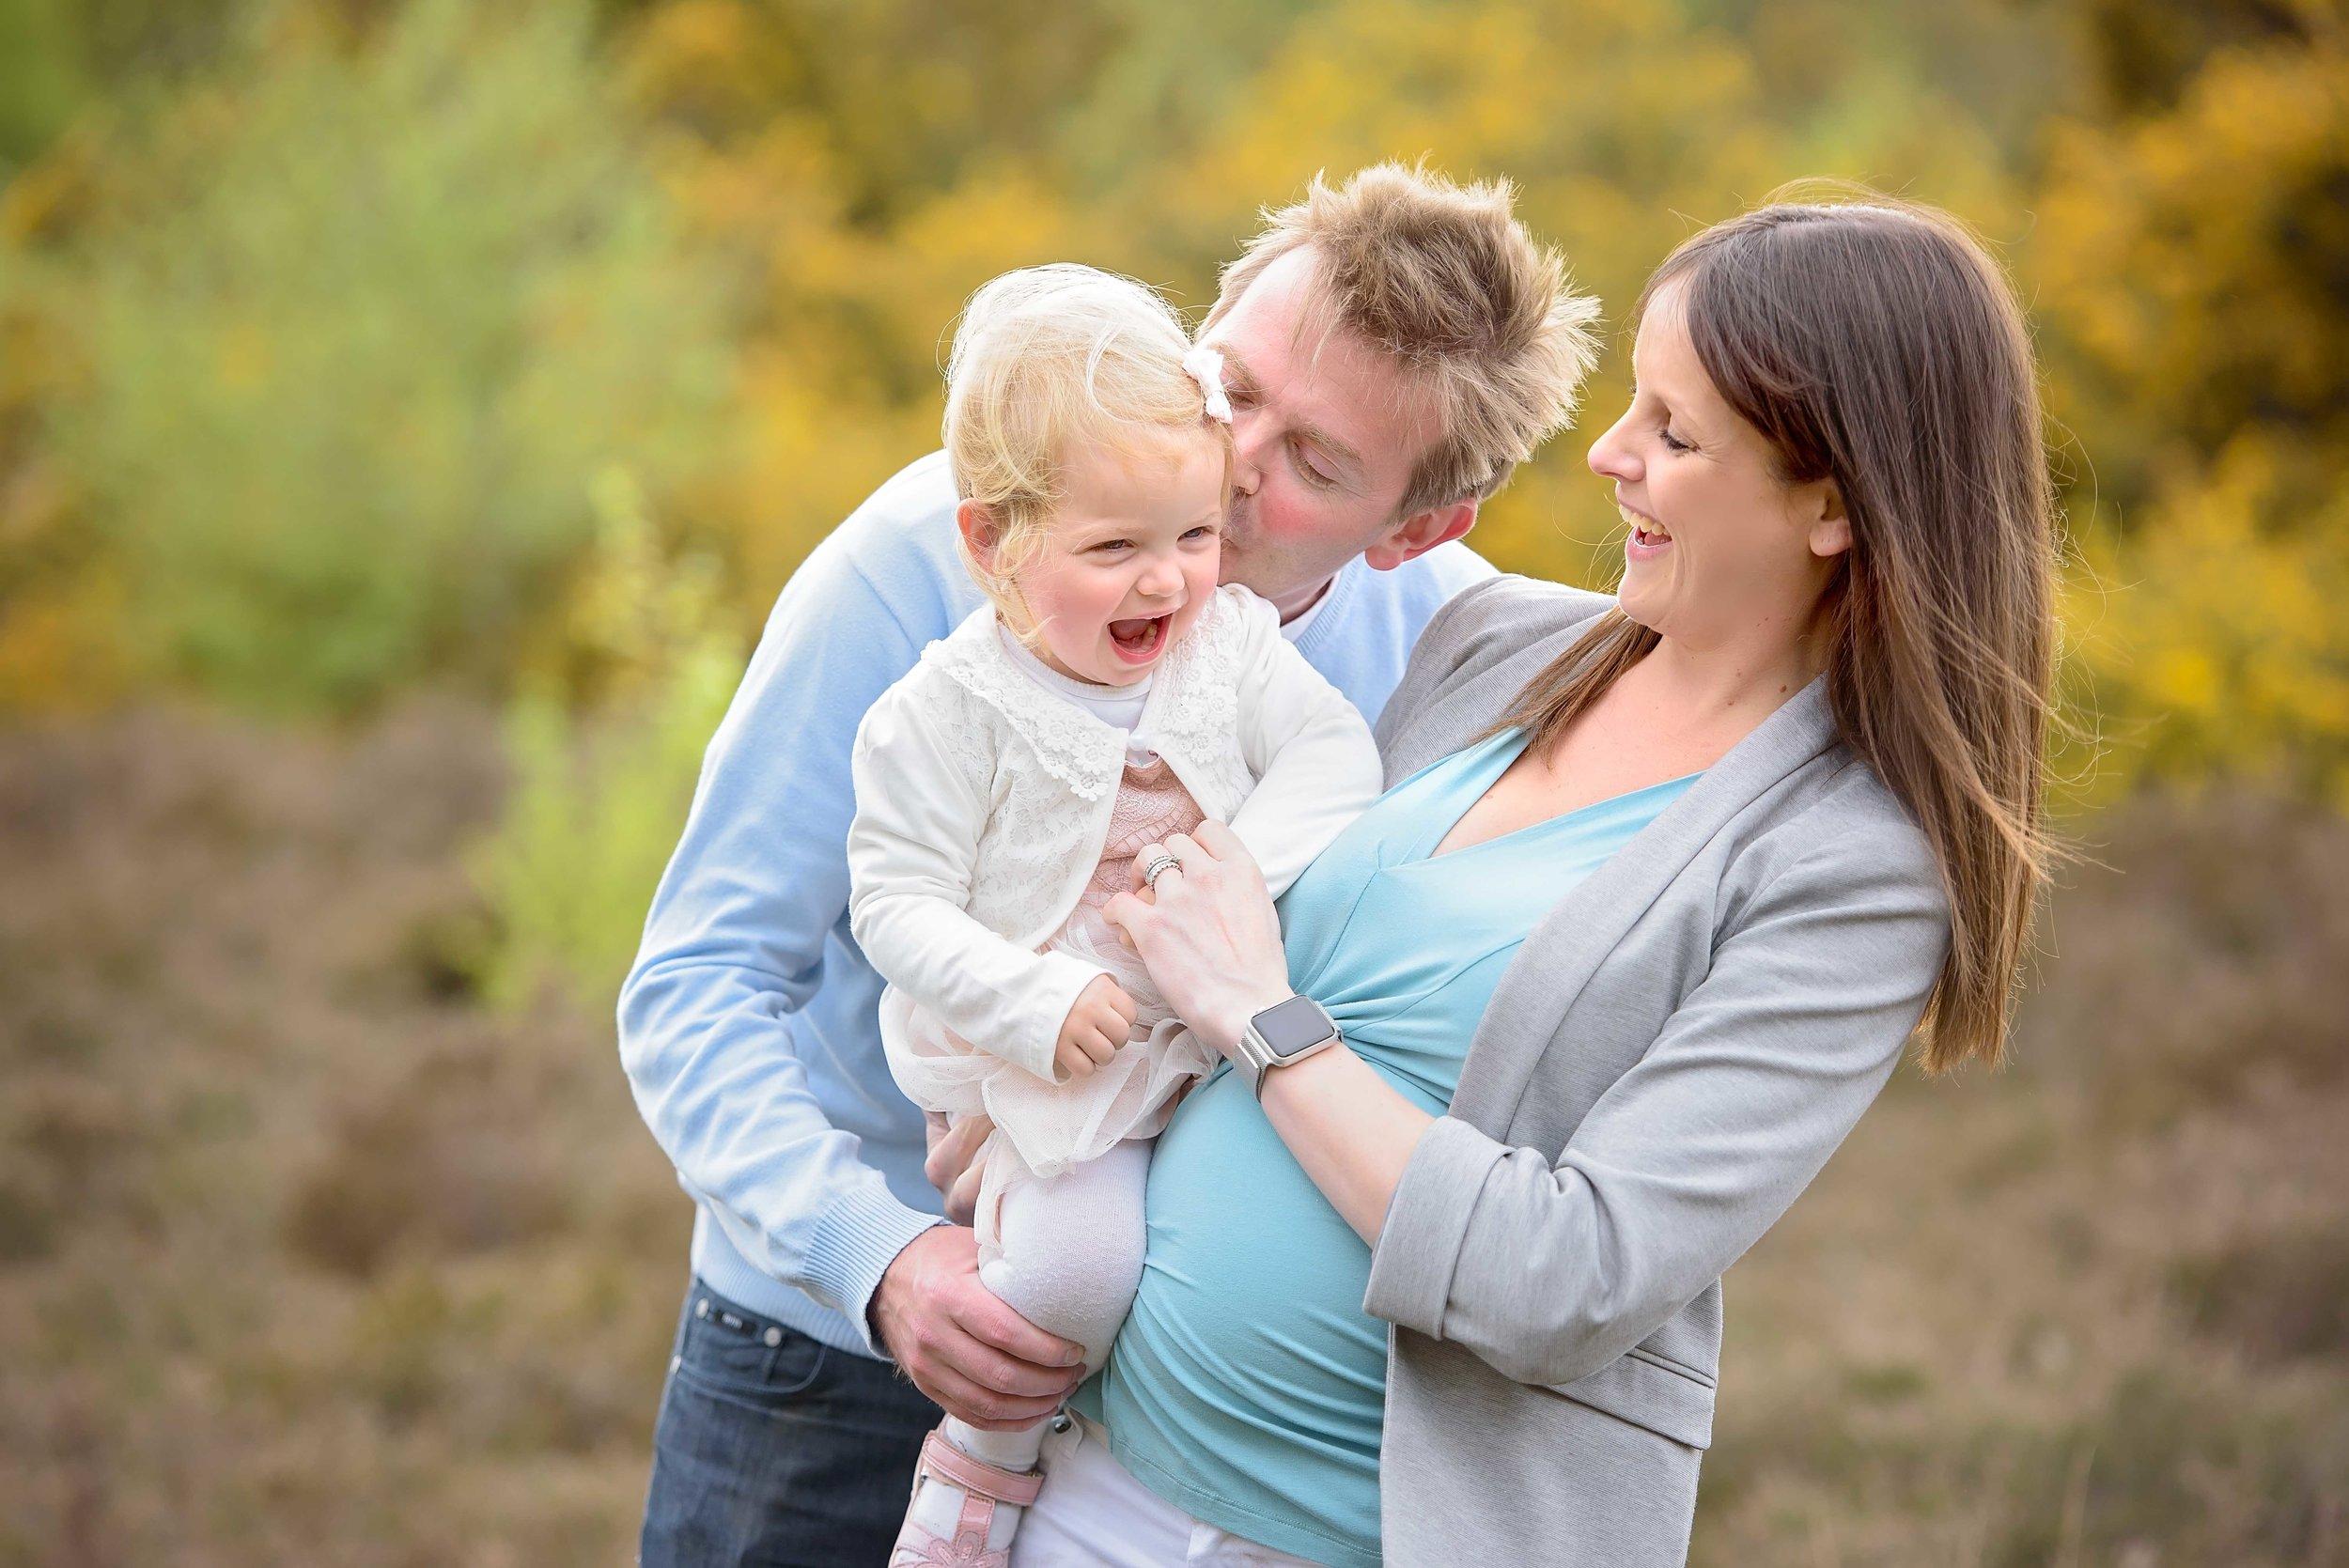 Professional family portrait photographer